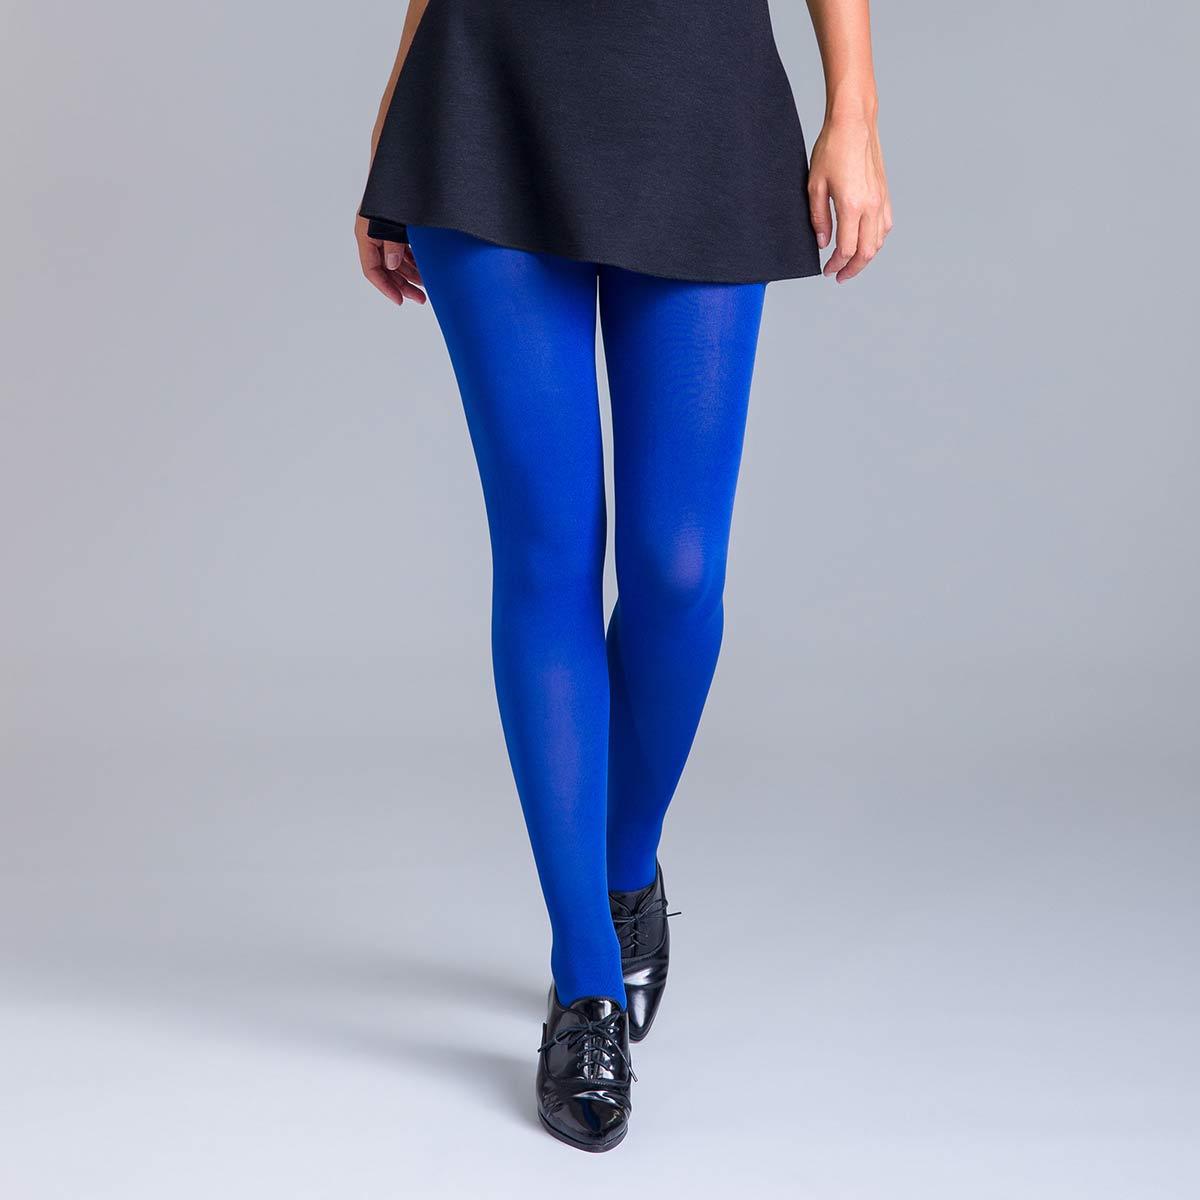 Collant ultra opaque bleu neptune 80D Style